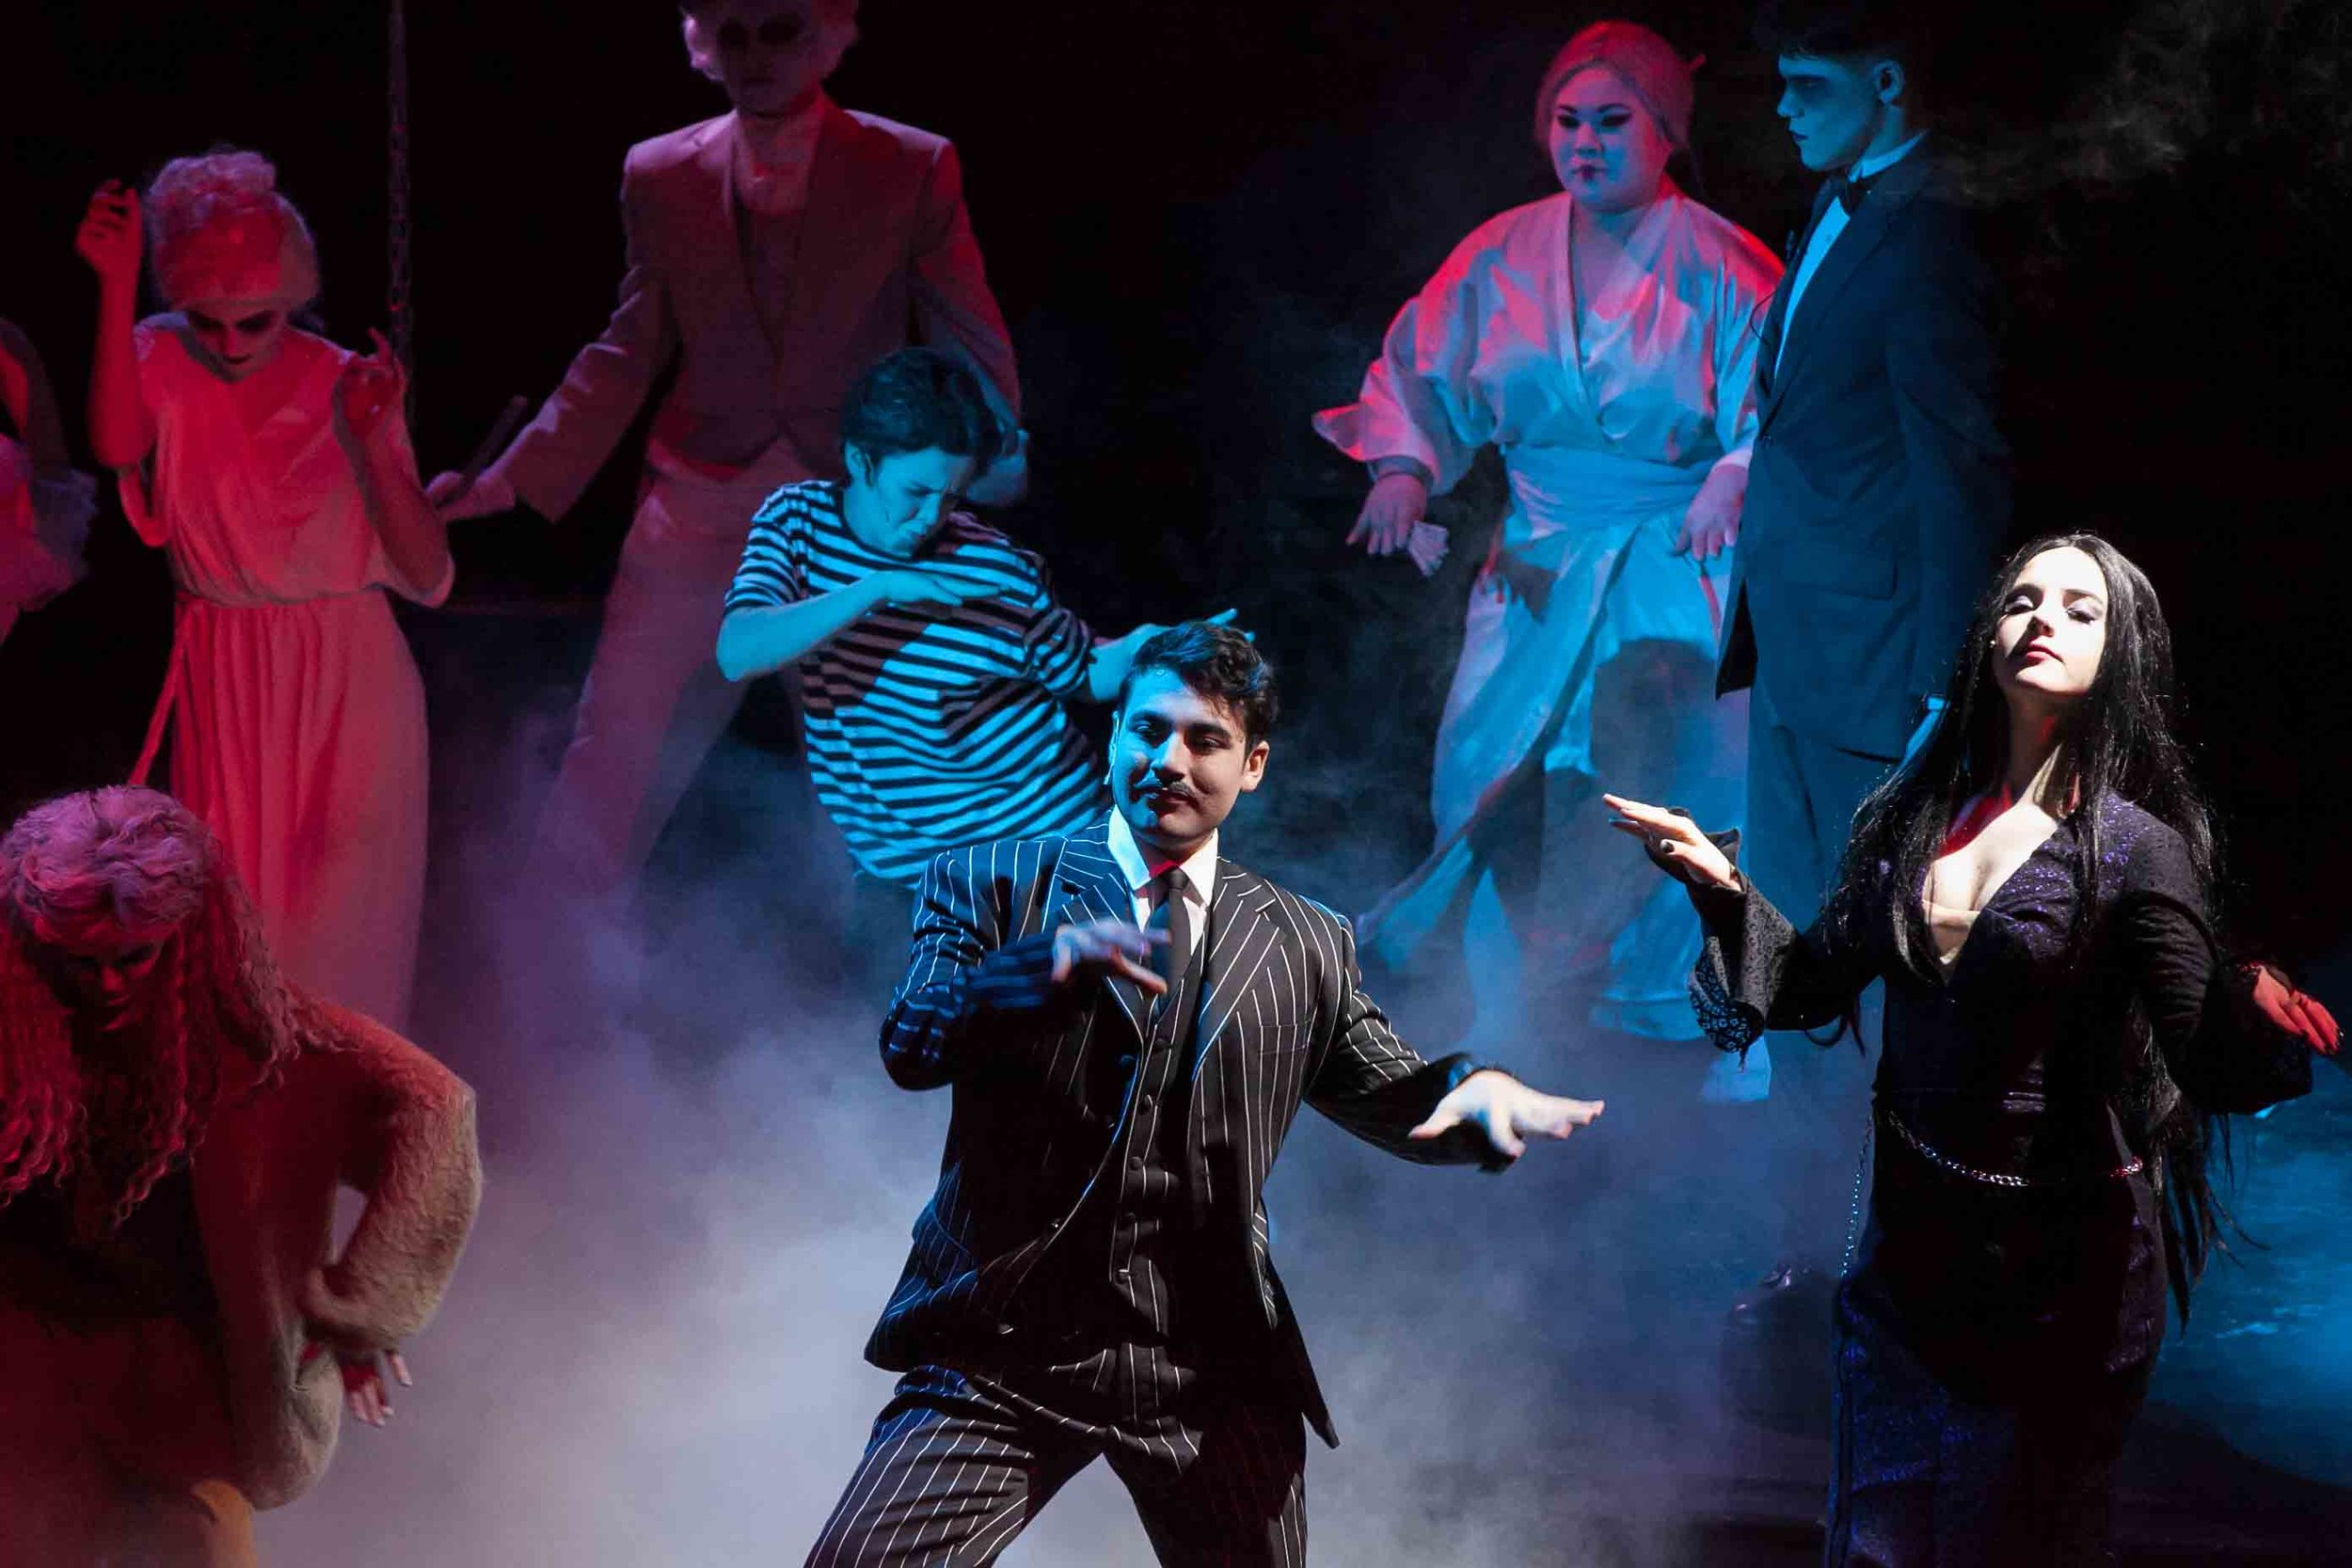 6-19-16 Addams Family Creepy Cast 0048.jpg